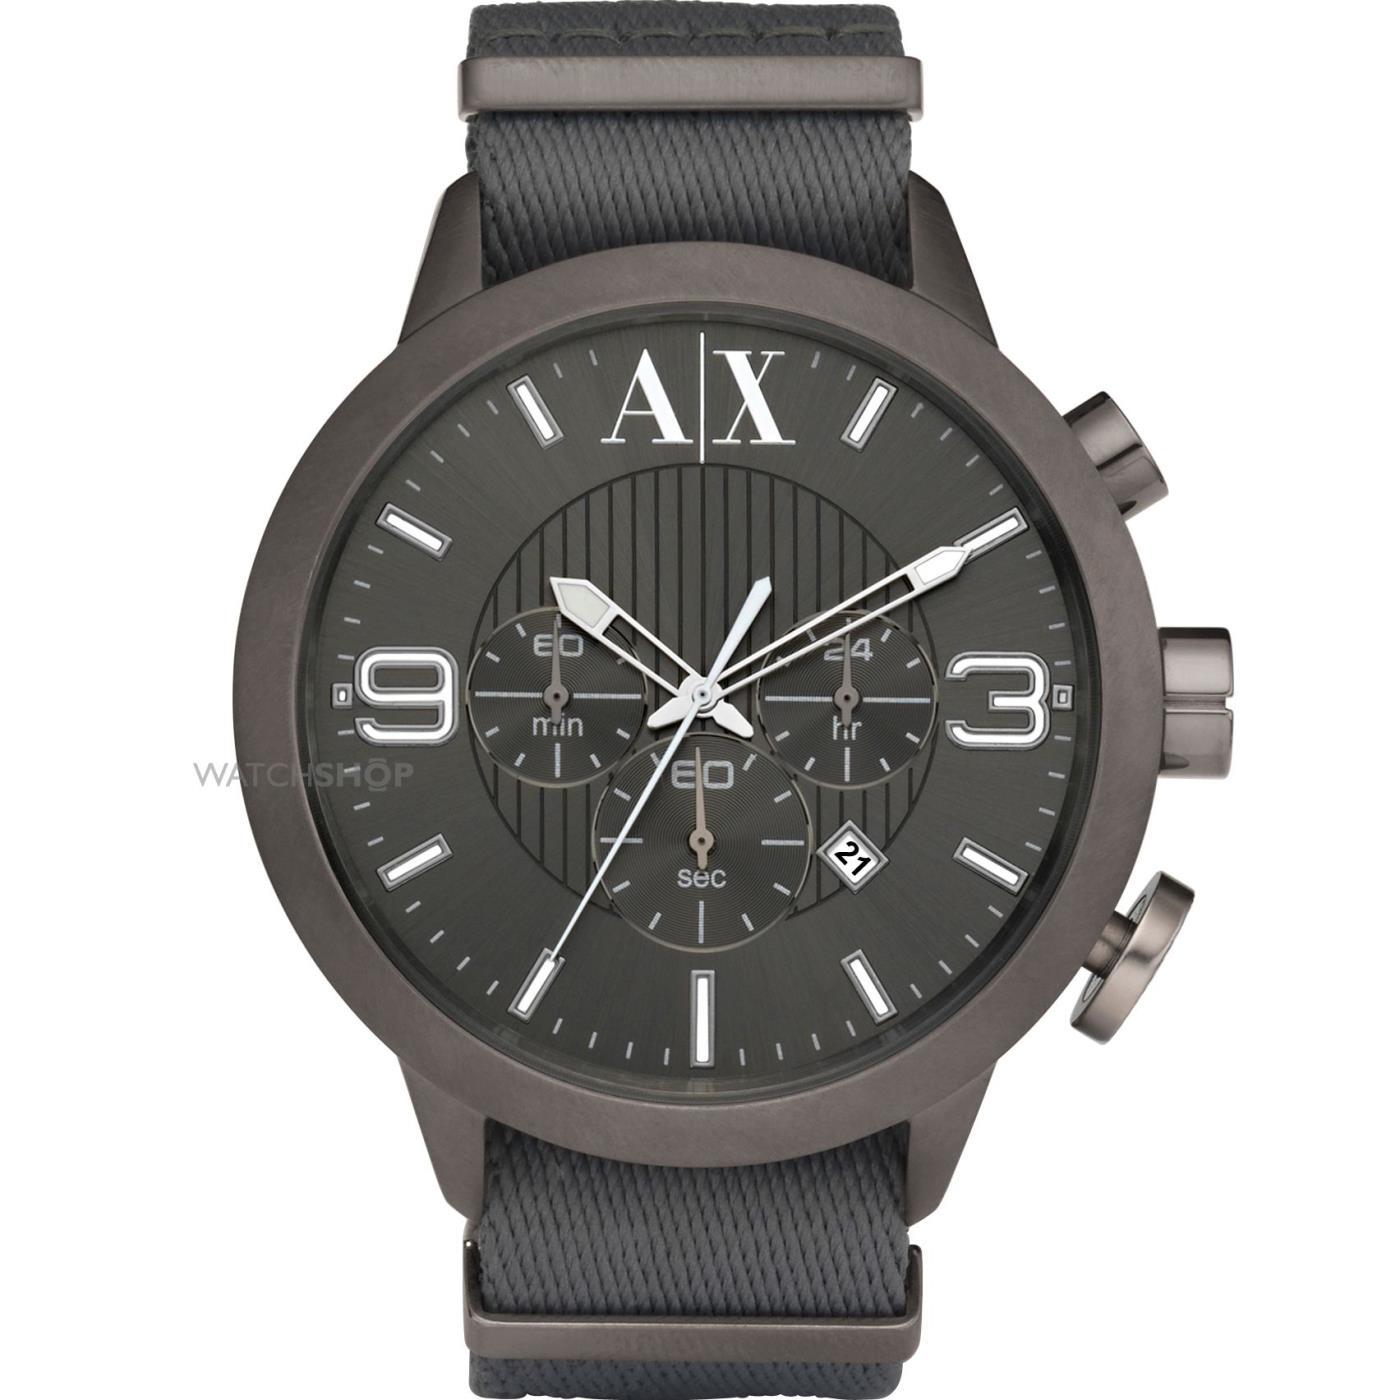 5369c3f50 Armani Exchange Active Chronograph Mens Watch AX1146